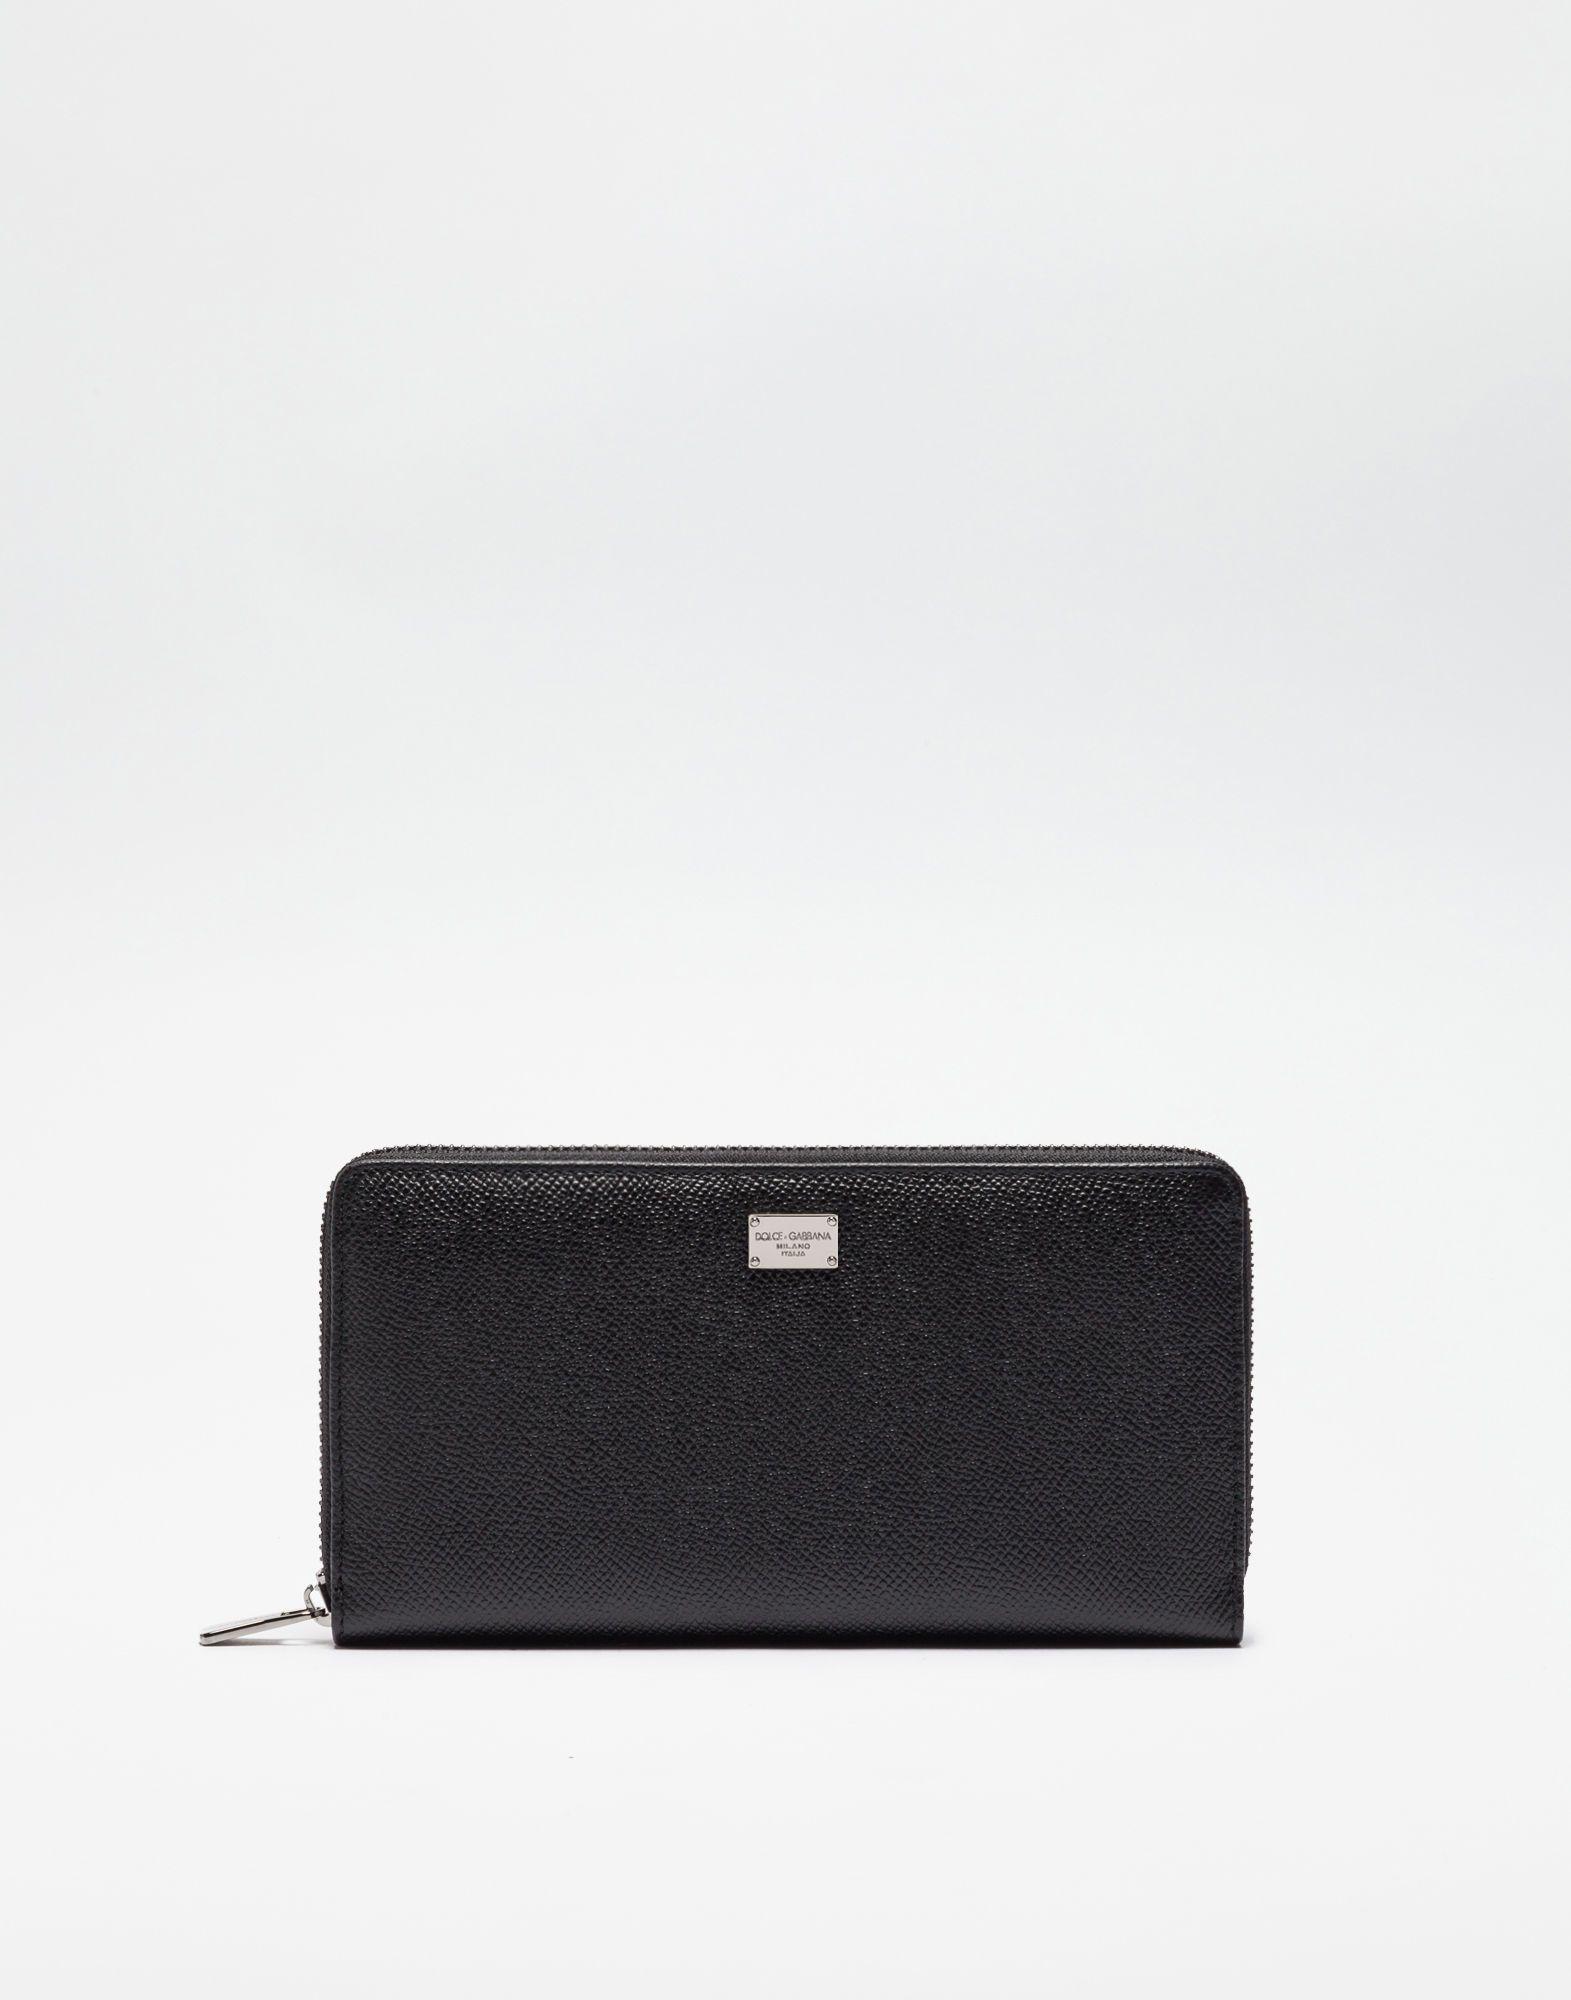 0bec87616b DOLCE   GABBANA Zip Around Wallet In Dauphine Leather.  dolcegabbana ...